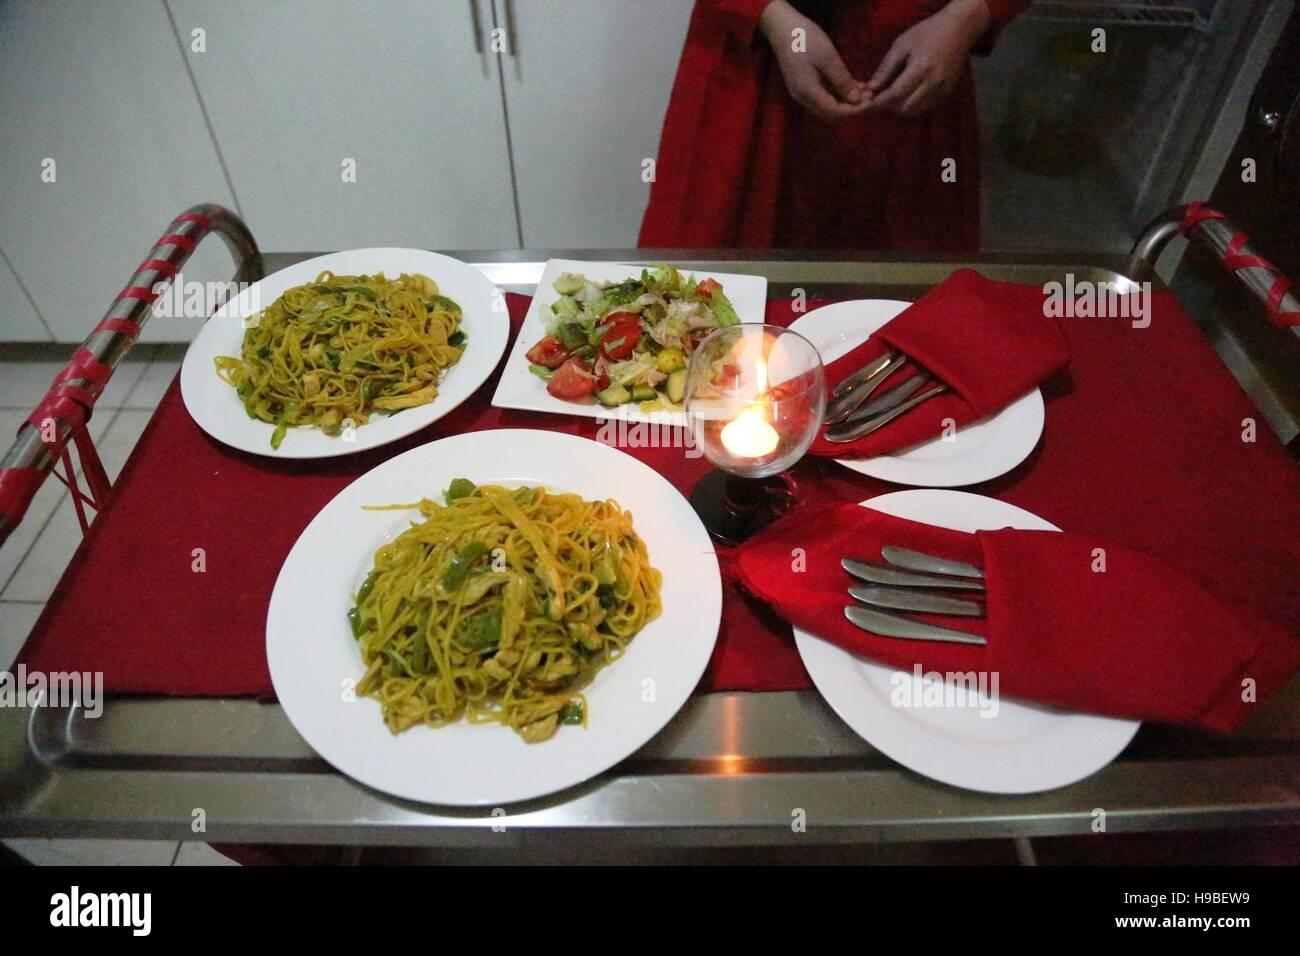 Kabul, Afghanistan. 16th Nov, 2016. Photo taken on Nov. 16, 2016 shows food prepared by Bost Family Restaurant in - Stock Image